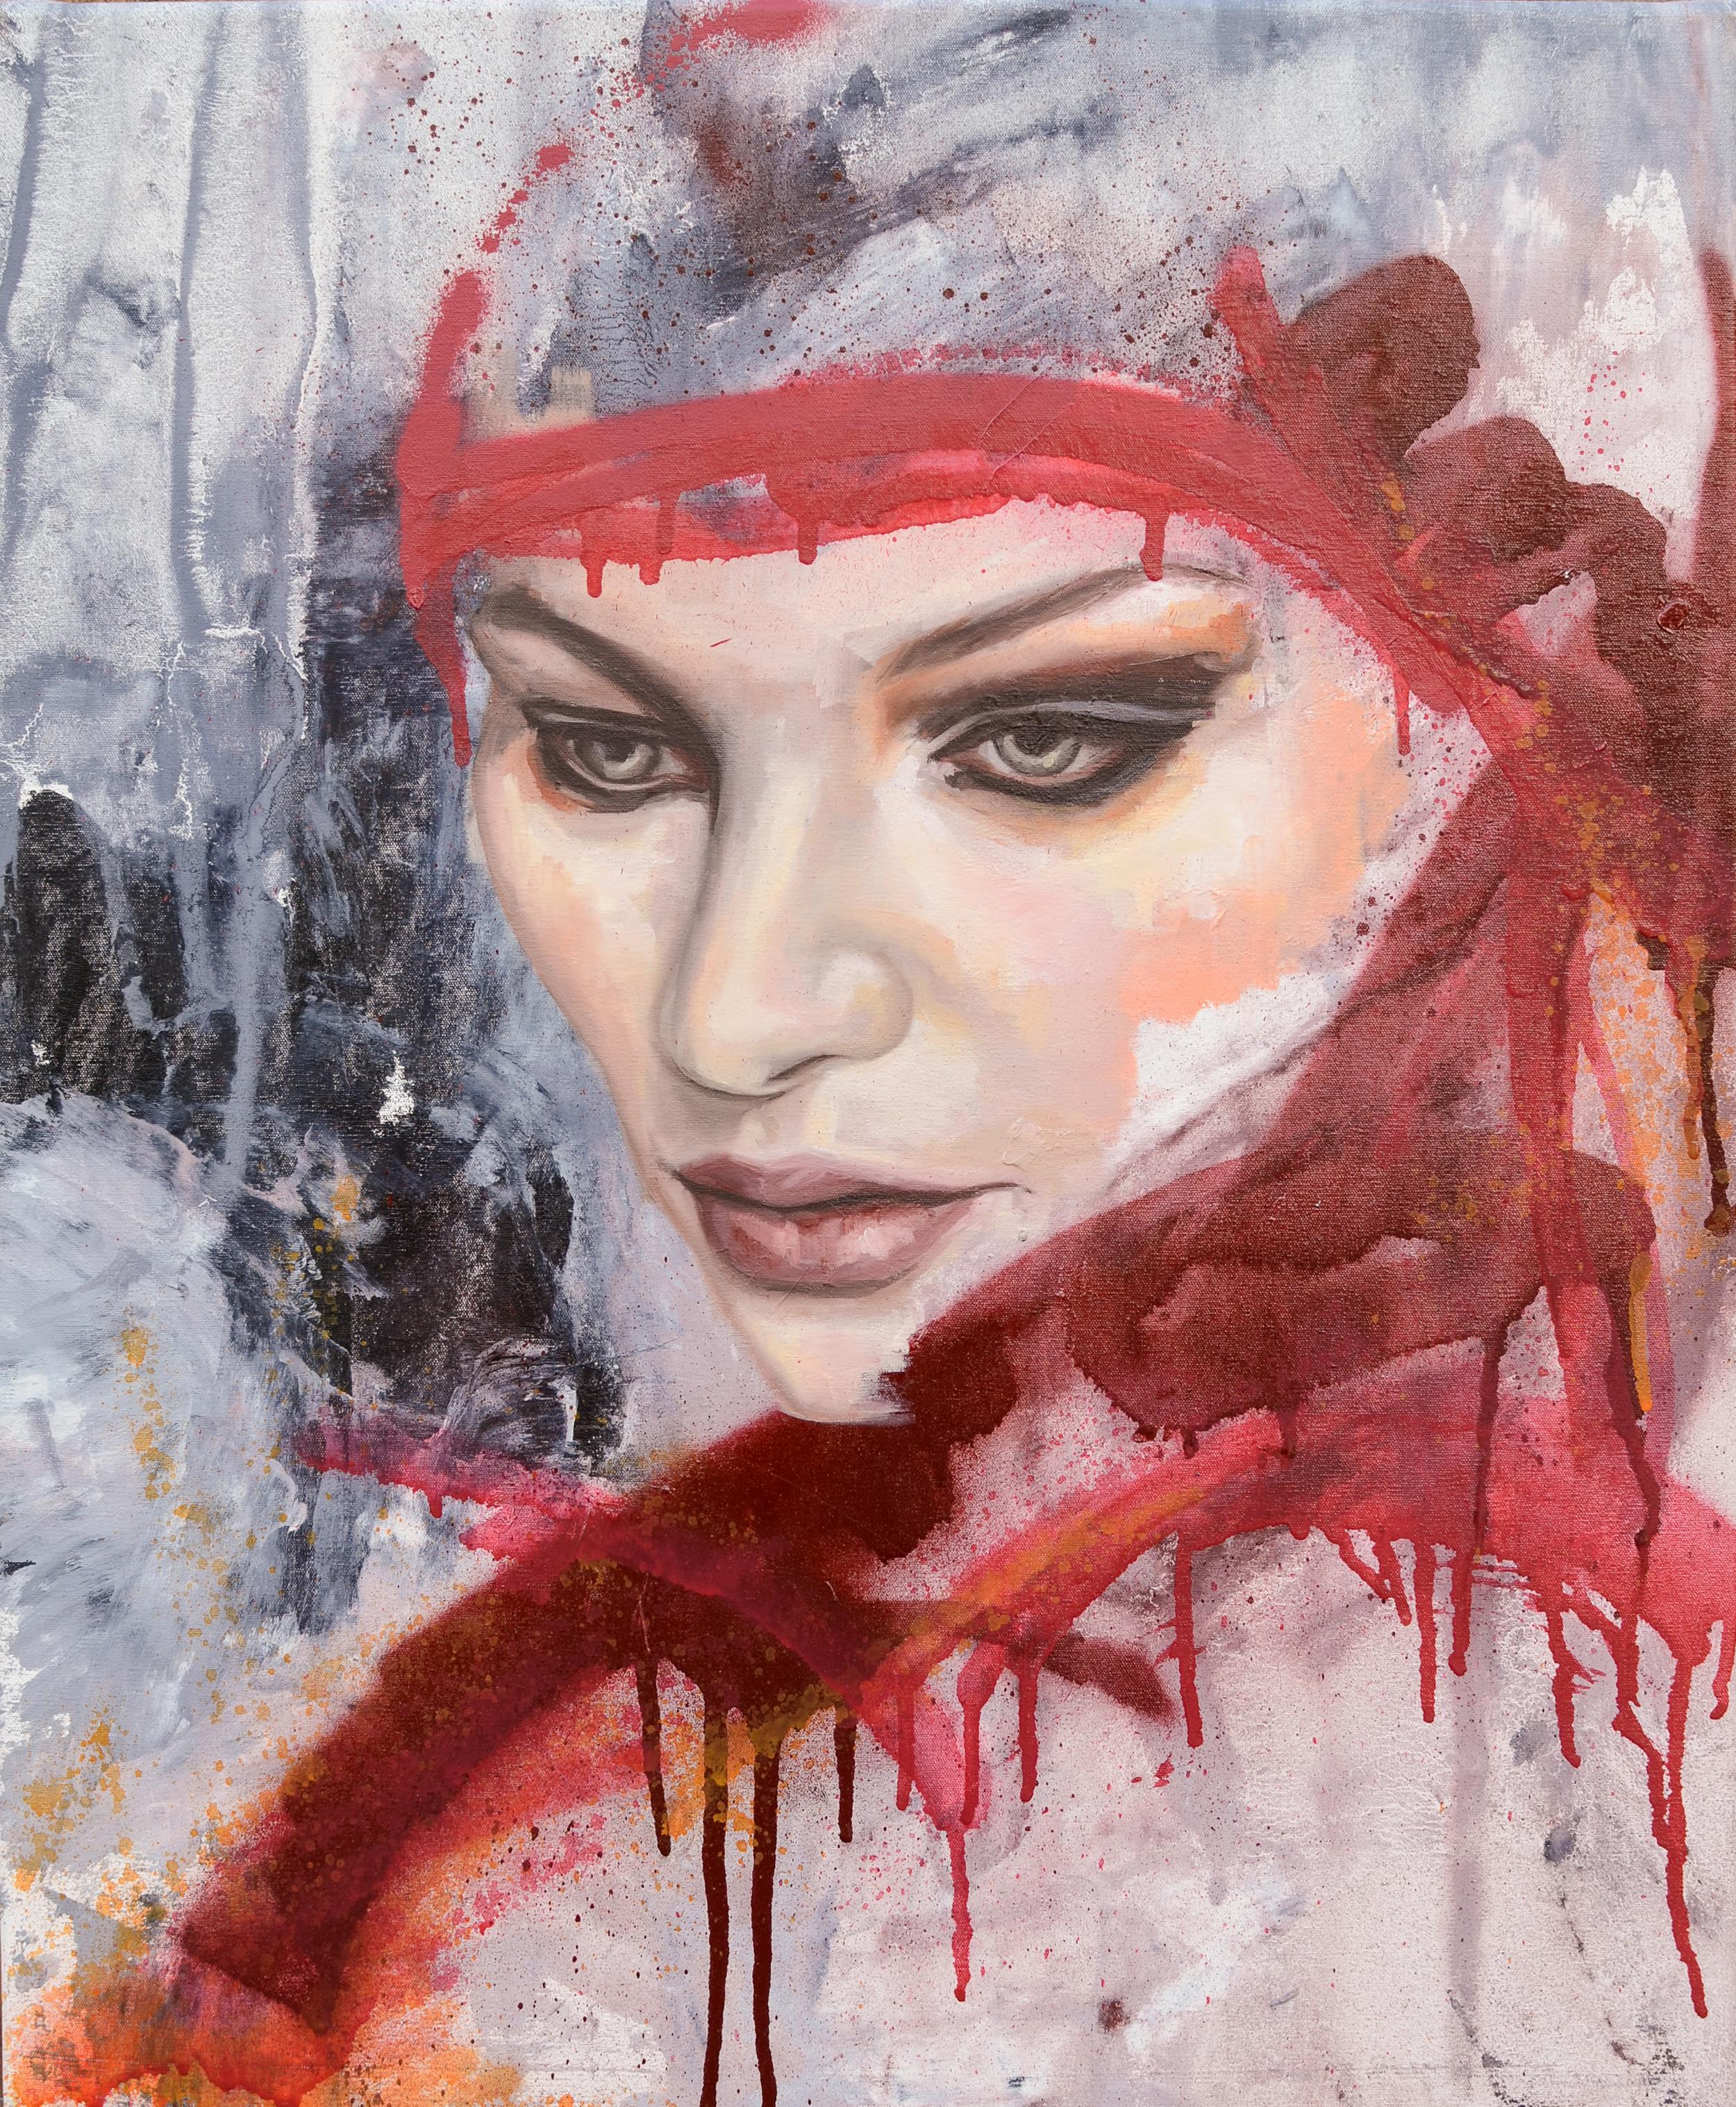 Truth, oil and spray enamel on canvas, 56x46cm, 2014 LG.jpg